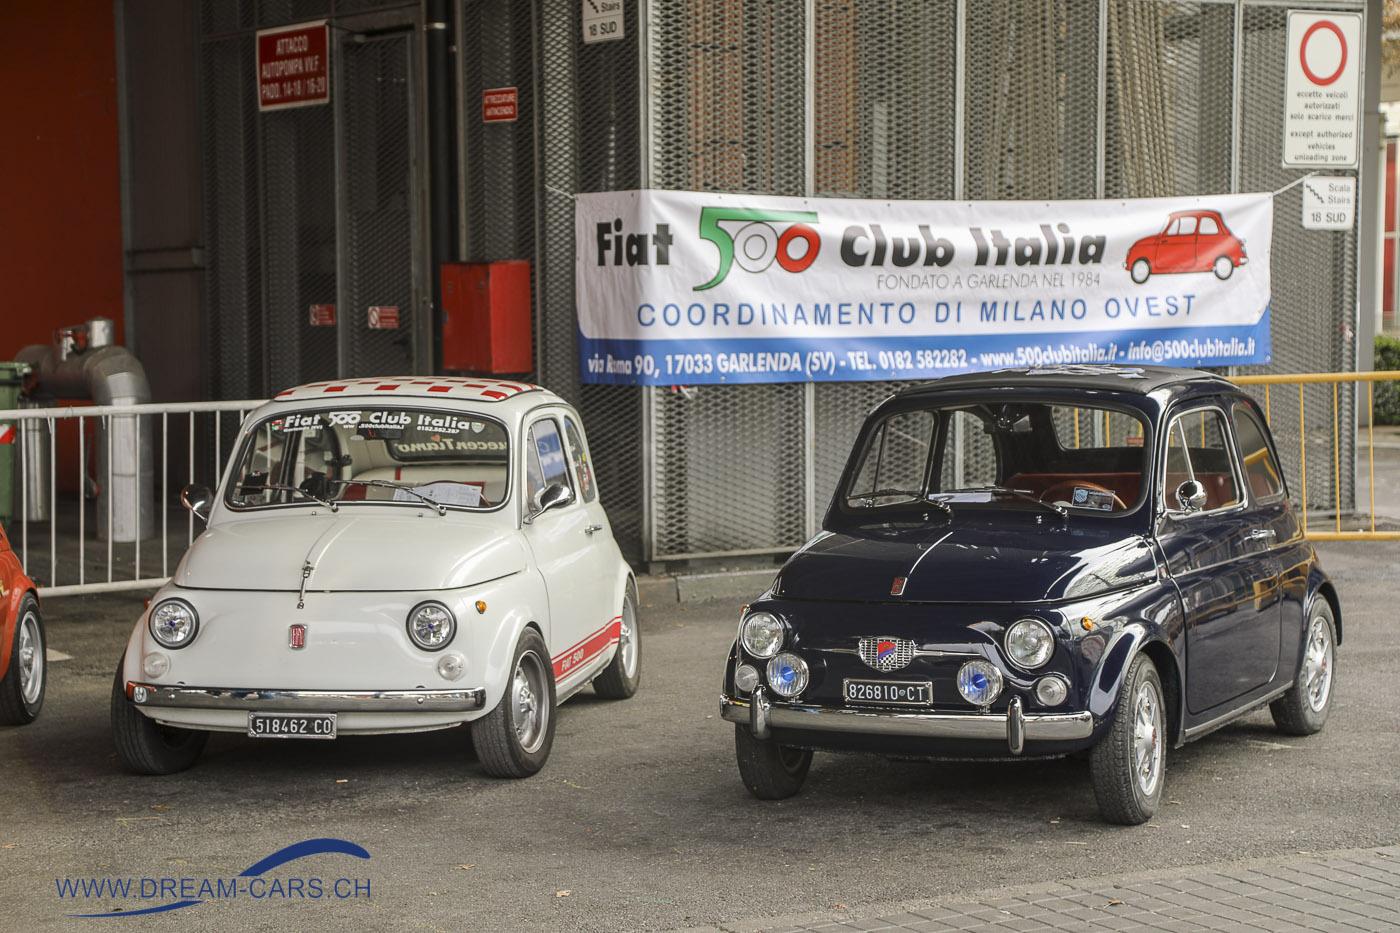 Milano AutoClassica, 23. - 25. November 2018. Etwa 30 Fiat 500 besuchten die Milano AutoClassica am Sonntagnachmittag.